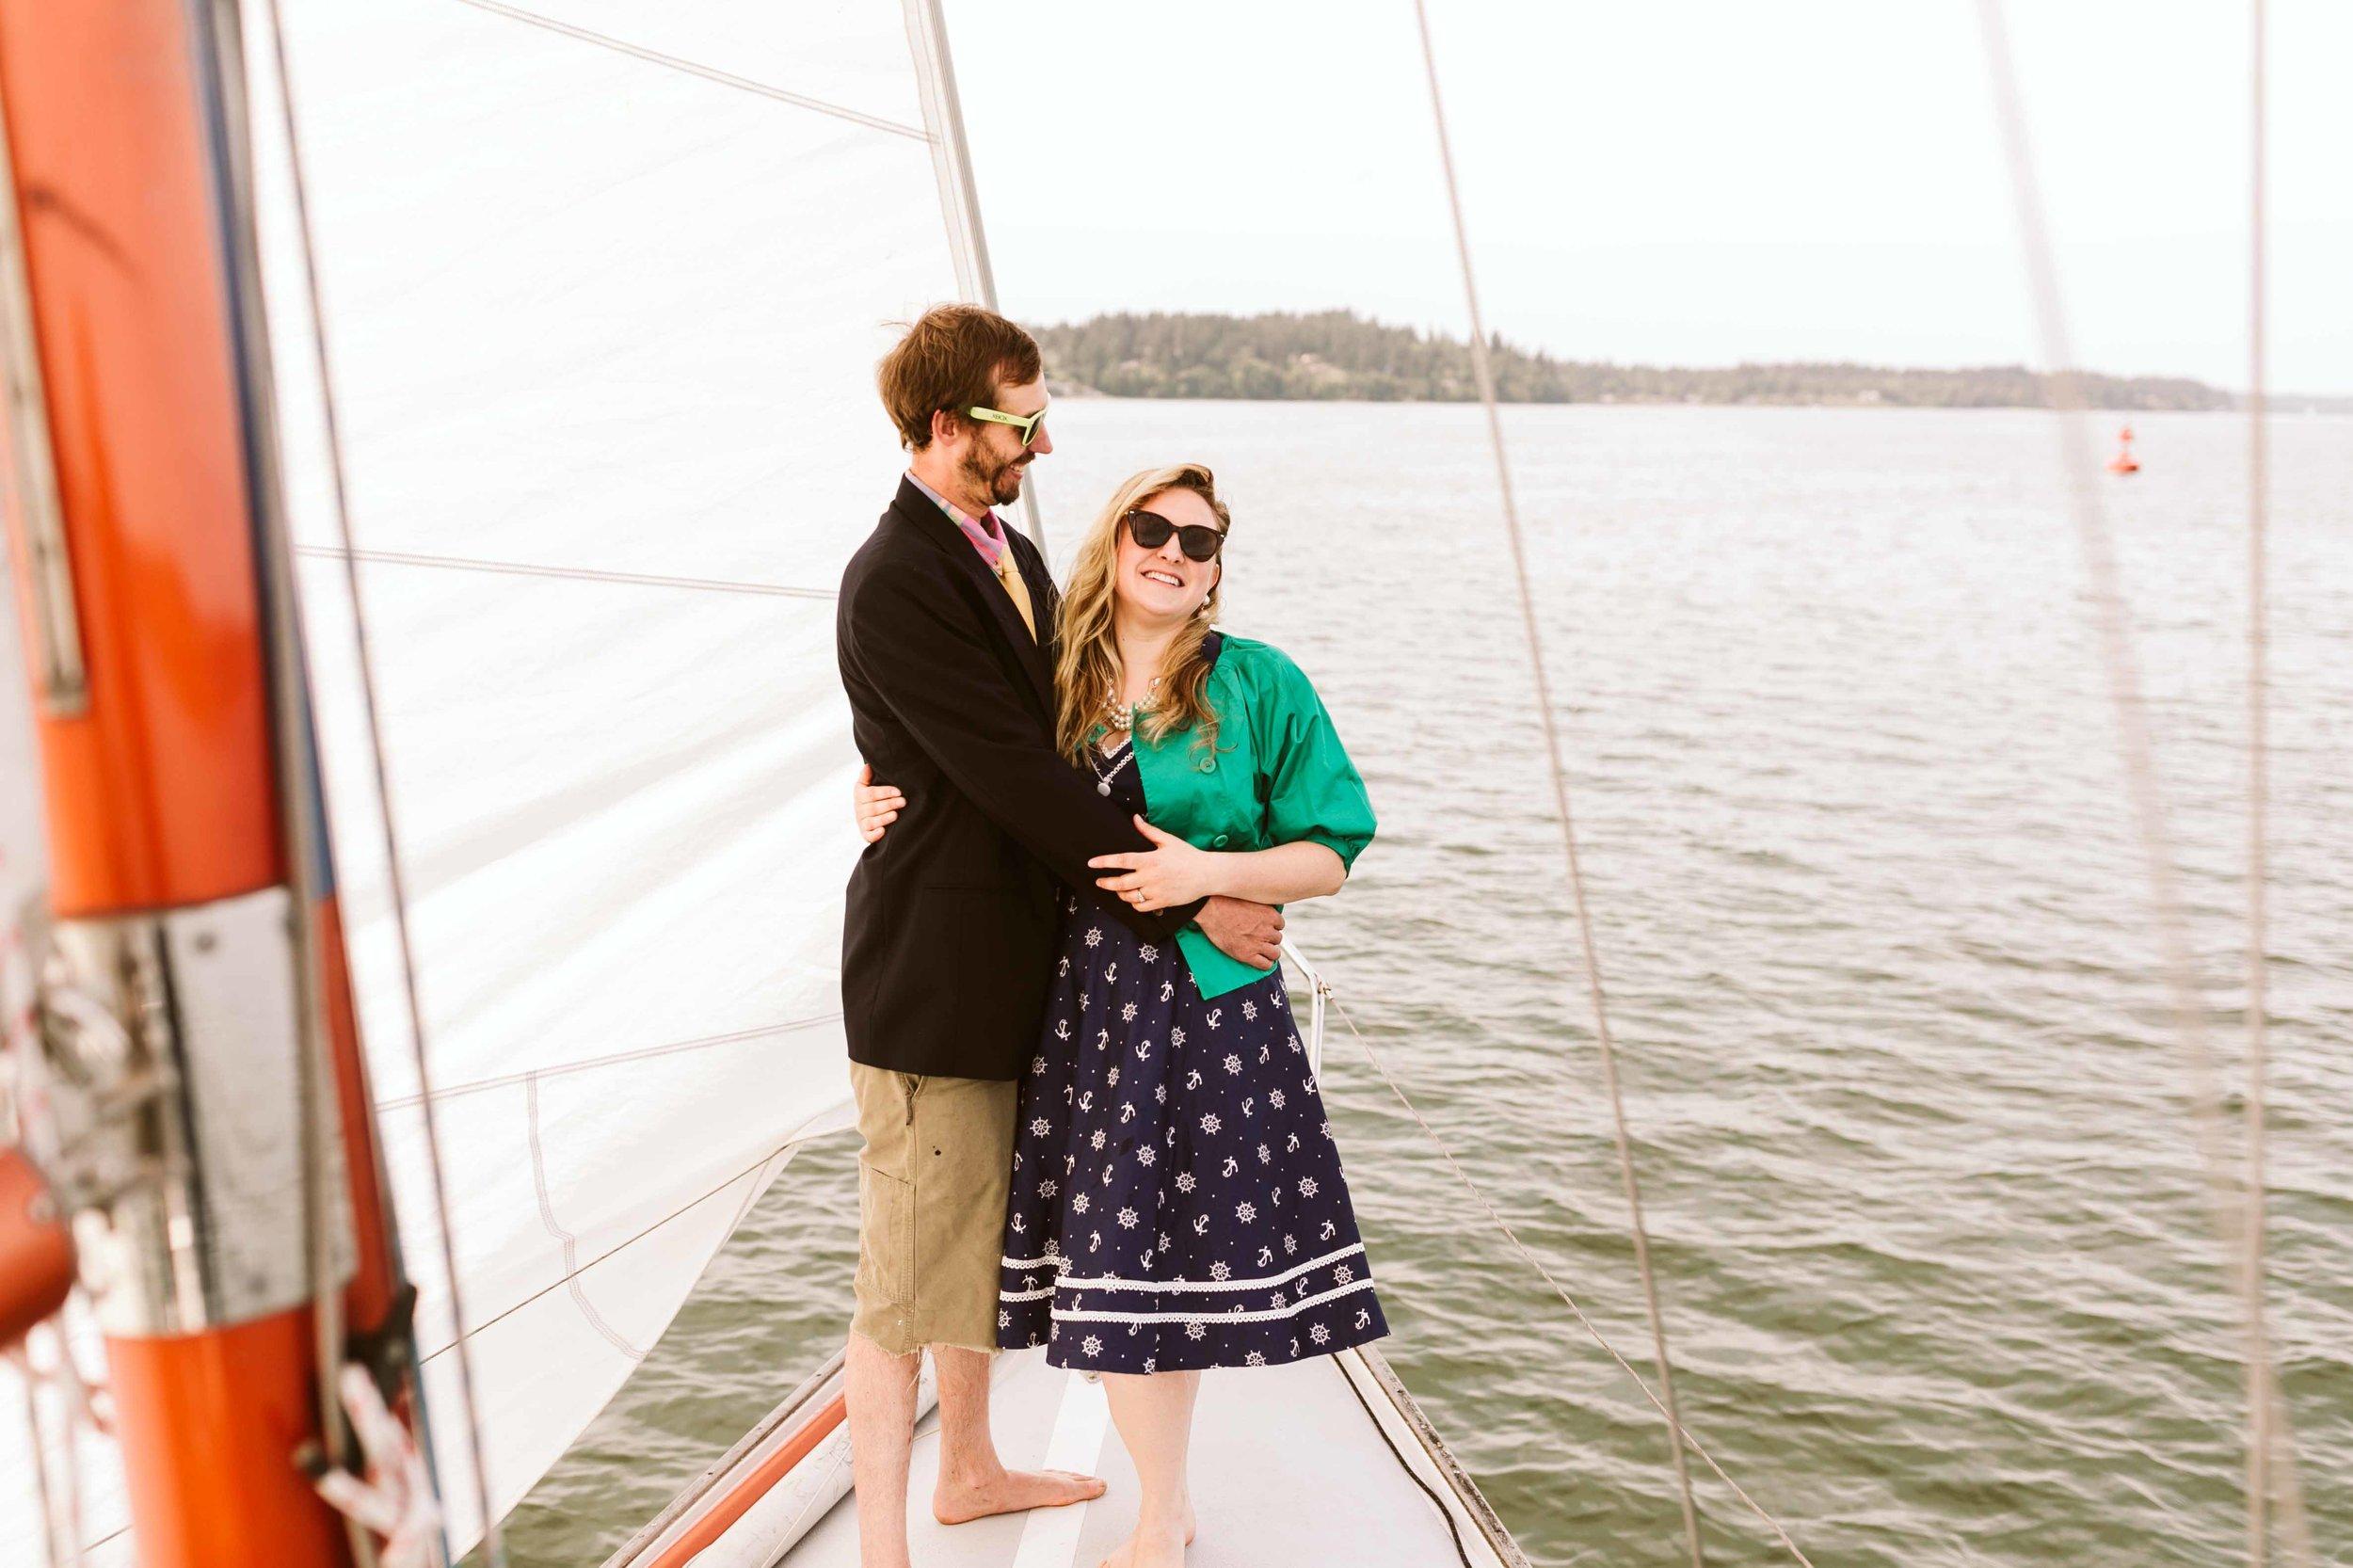 sailboat-engagement-photos-7.jpg